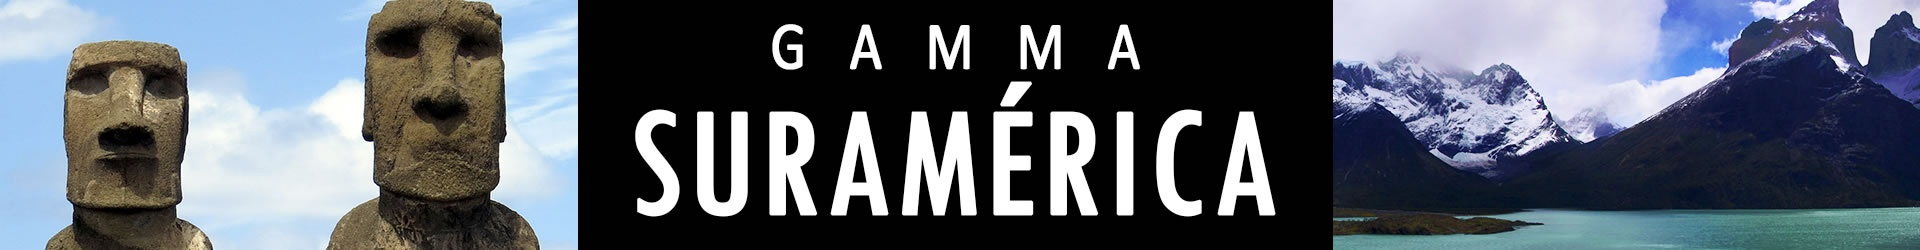 Gamma Suramérica